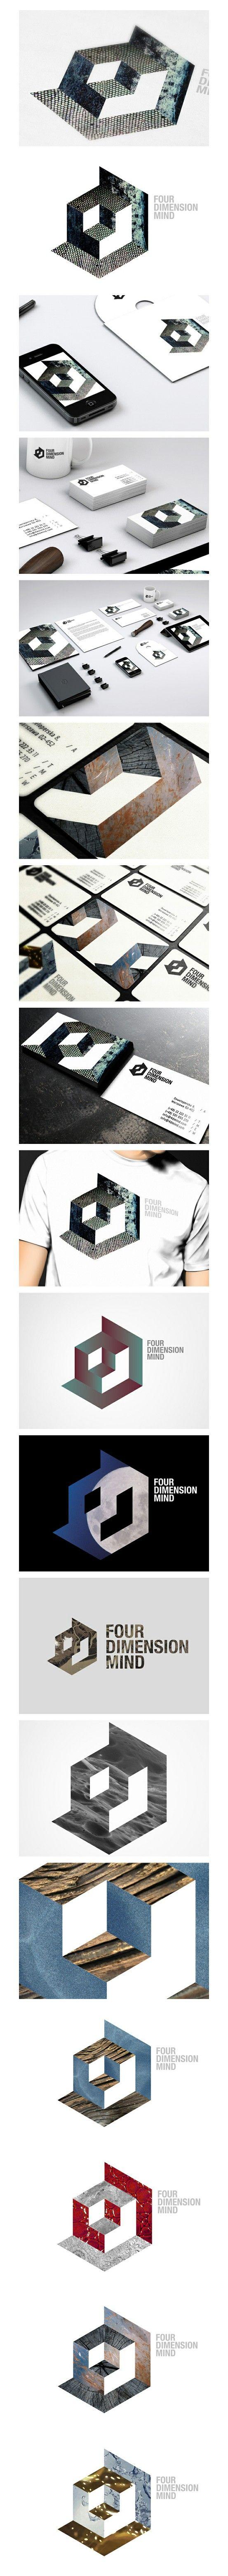 Cool Brand Identity Design on the Internet. 4DMIND. #branding #brandidentity #identitydesign